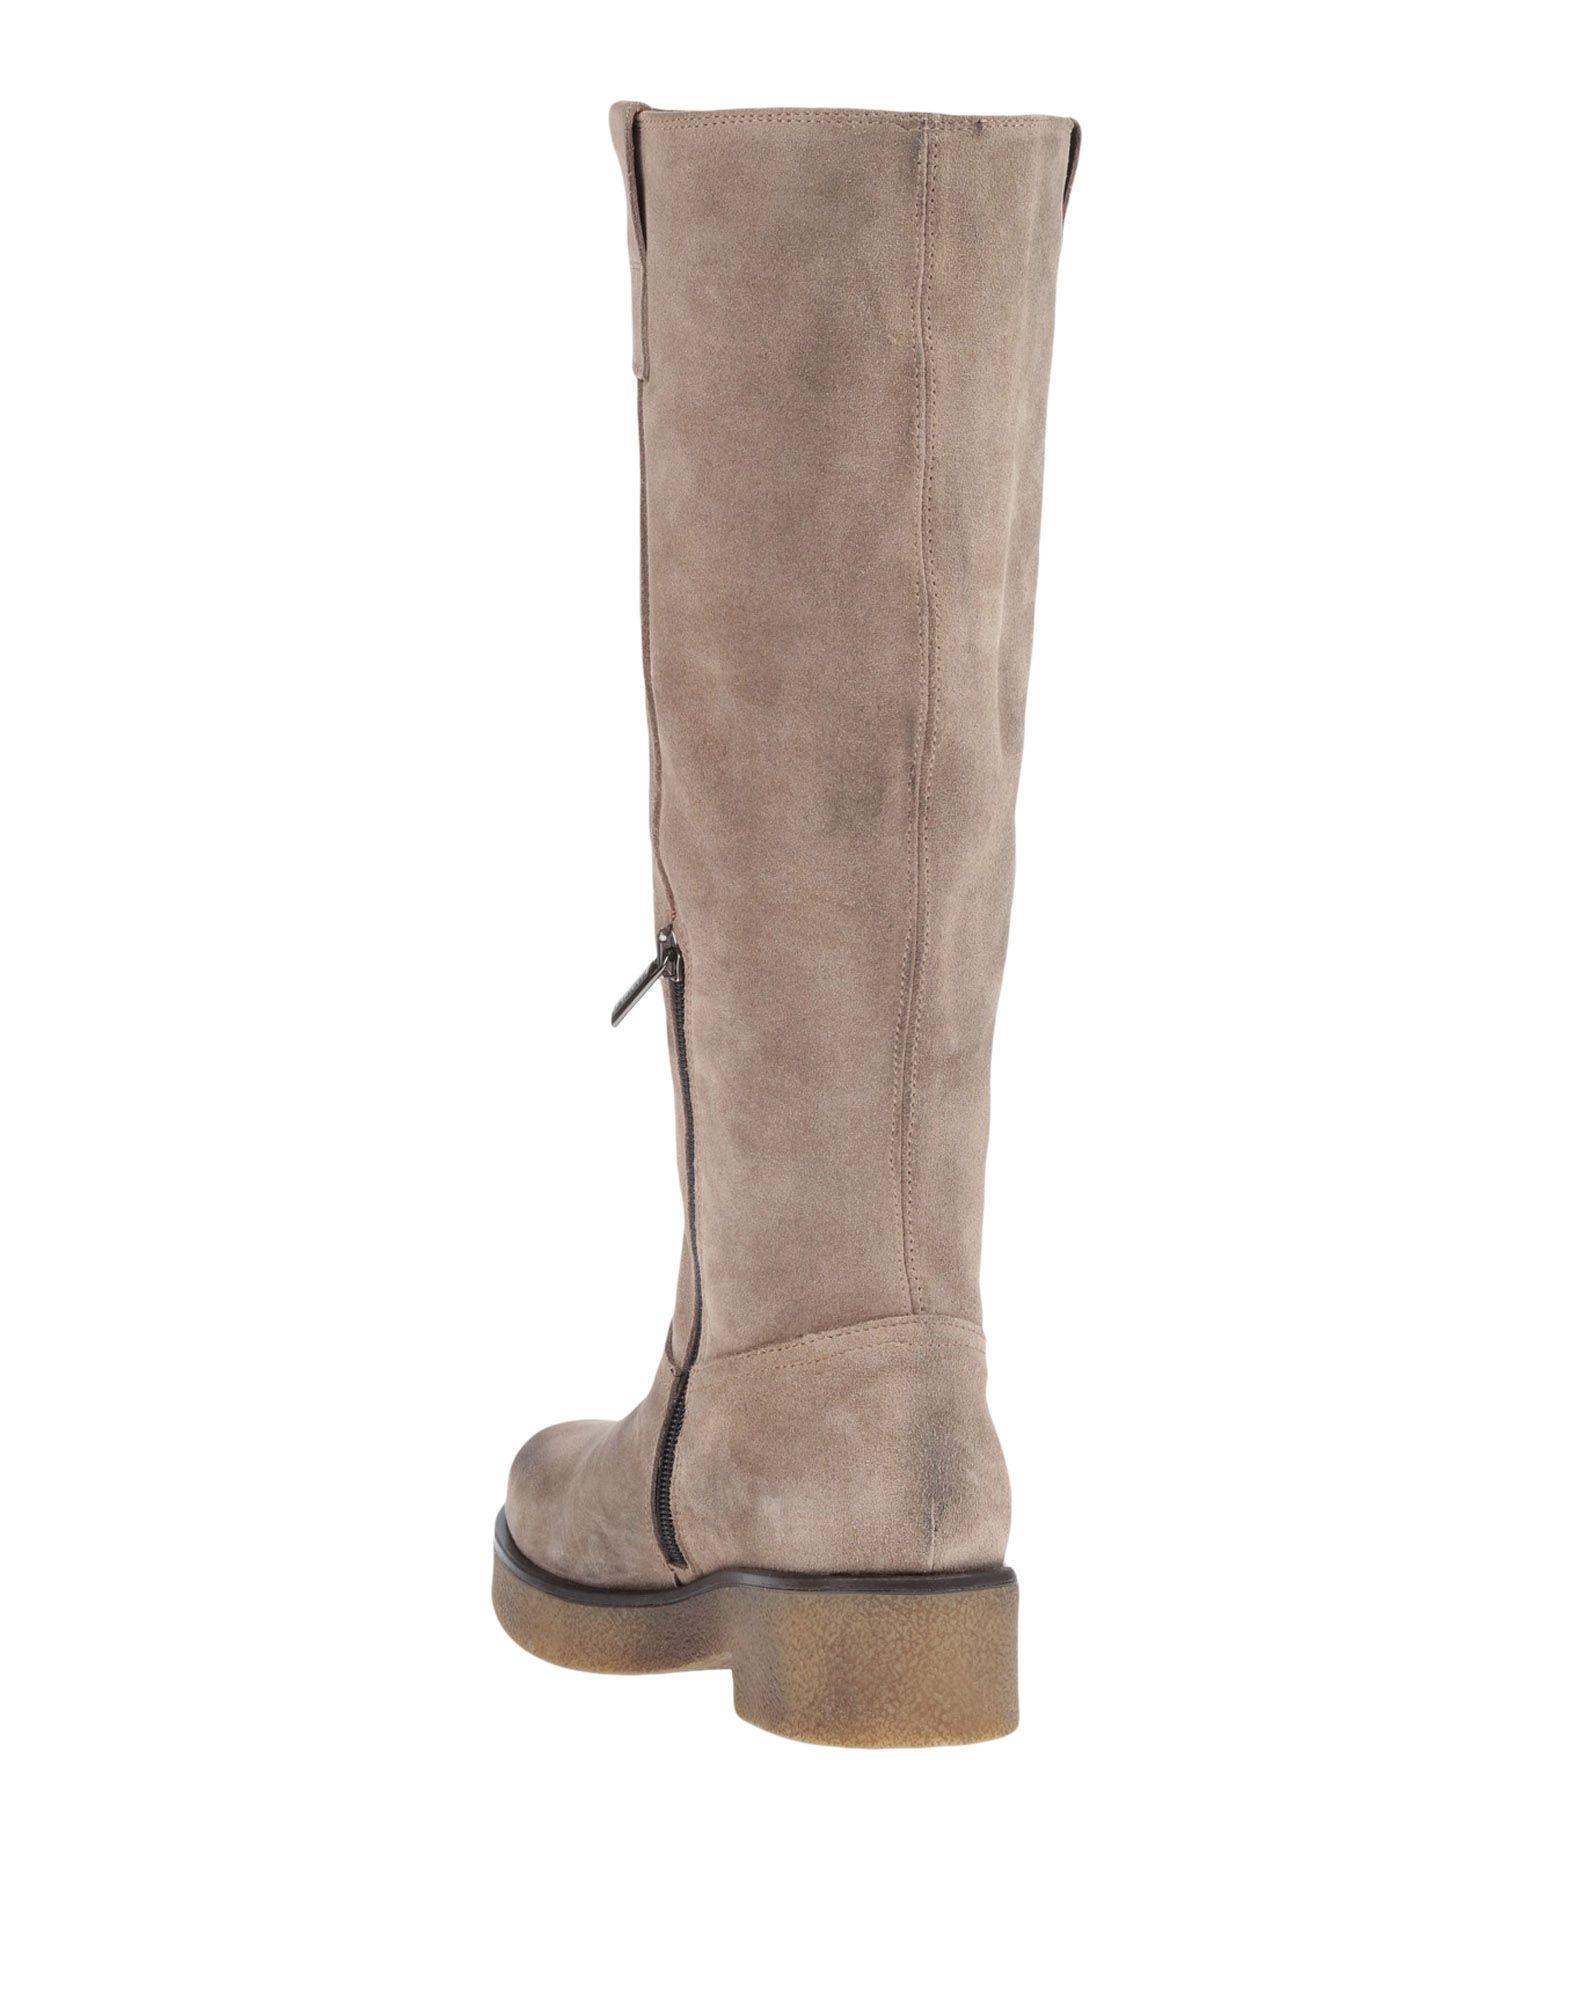 Stilvolle Luciani billige Schuhe Chiara Luciani Stilvolle Stiefel Damen  11582104RO a3d006